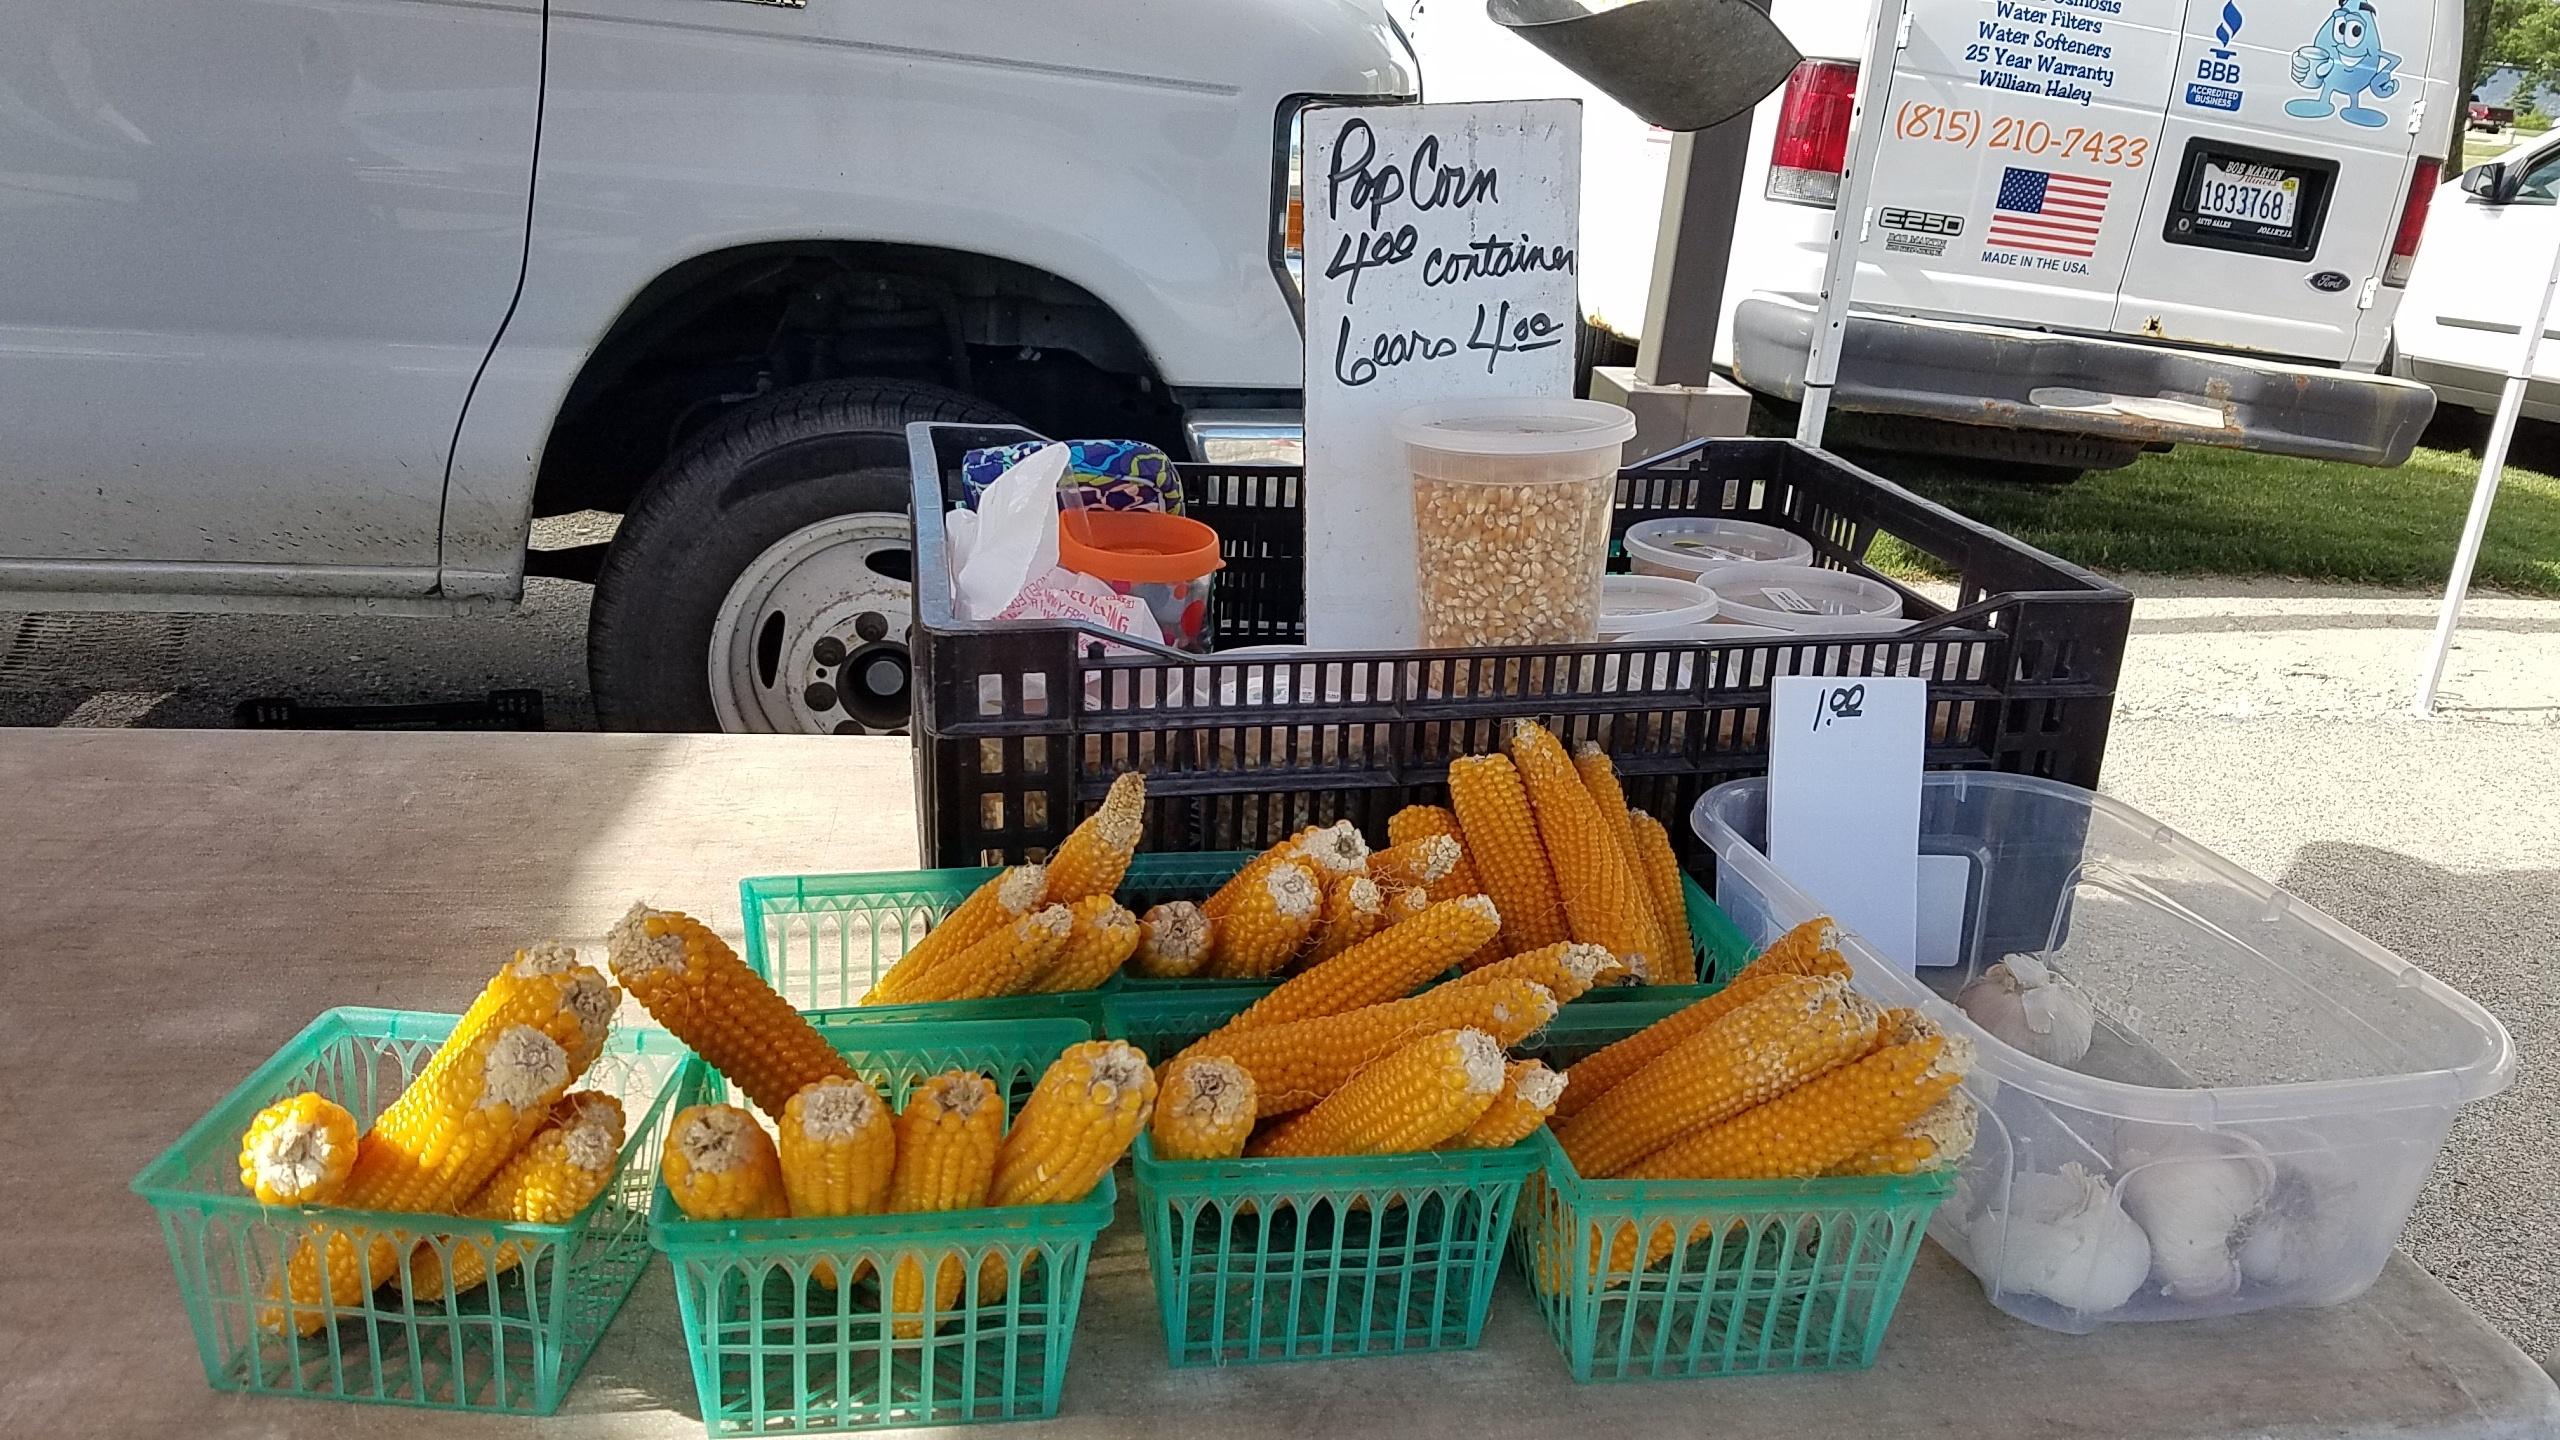 8 great finds at the jjc farmers market joliet junior college lange's family farms, llc popcorn on the cob